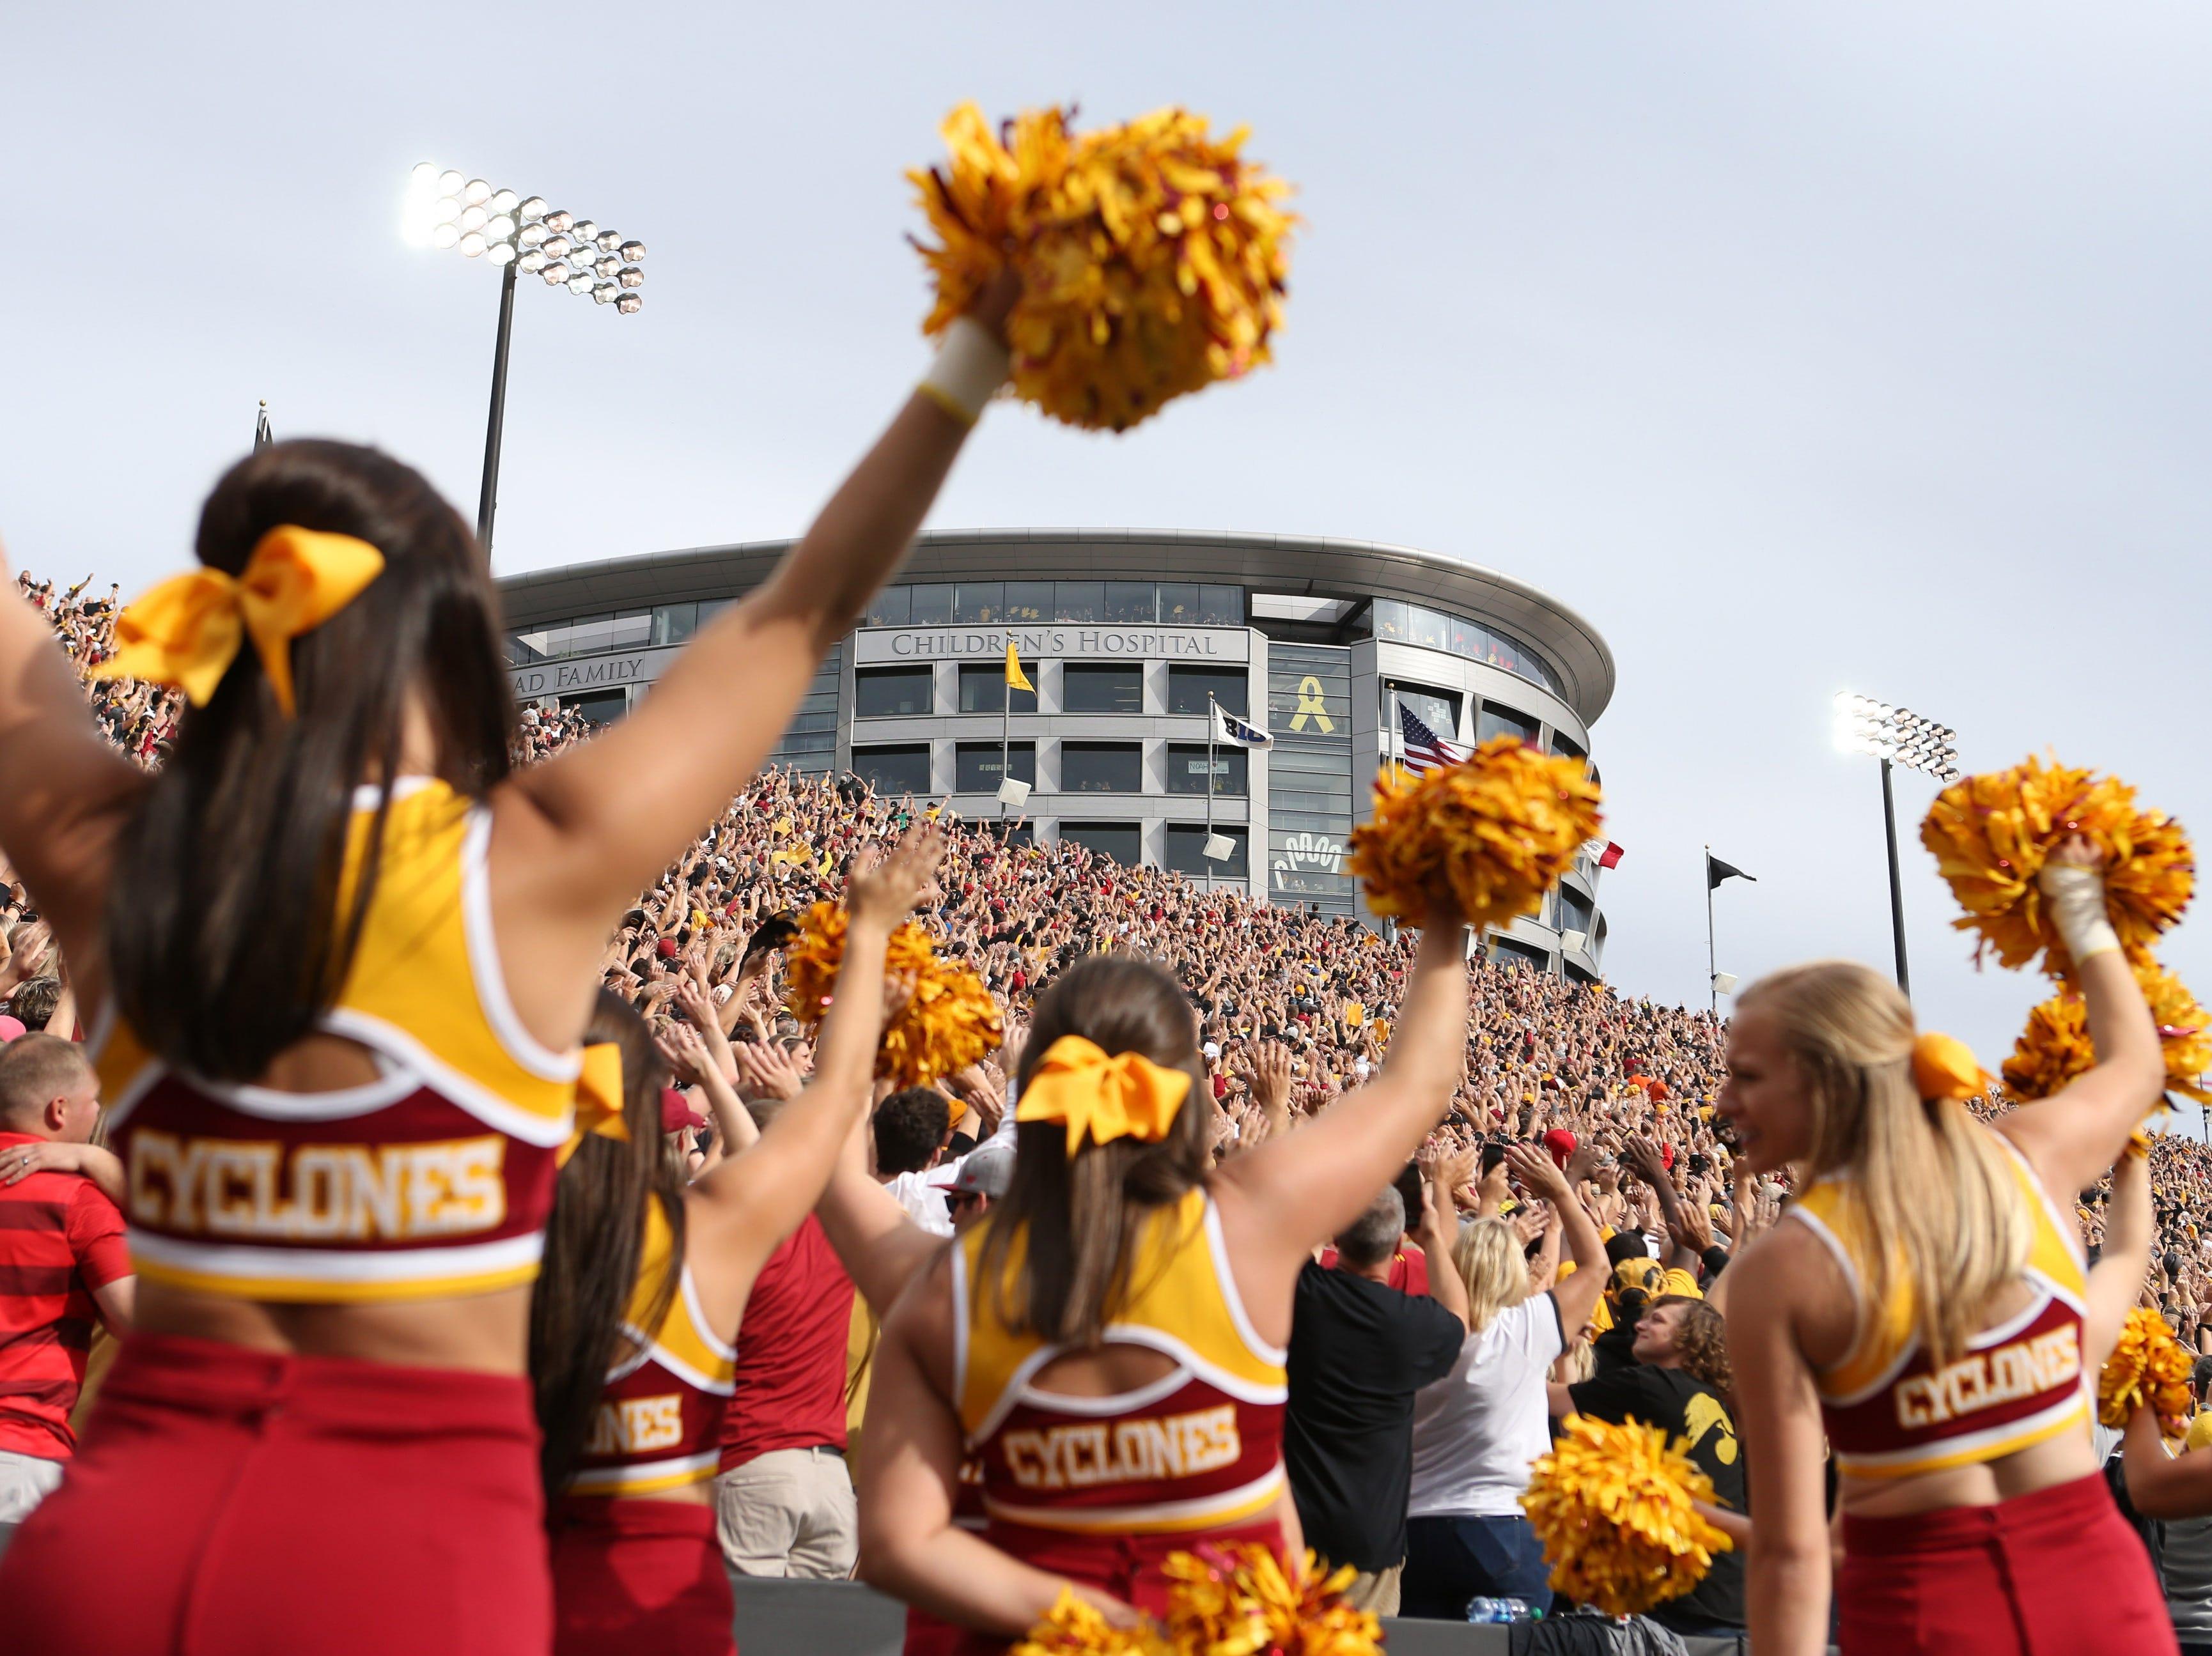 Week 2: Iowa State Cyclones cheerleaders take part in the Iowa Wave to the Iowa Children's Hospital.